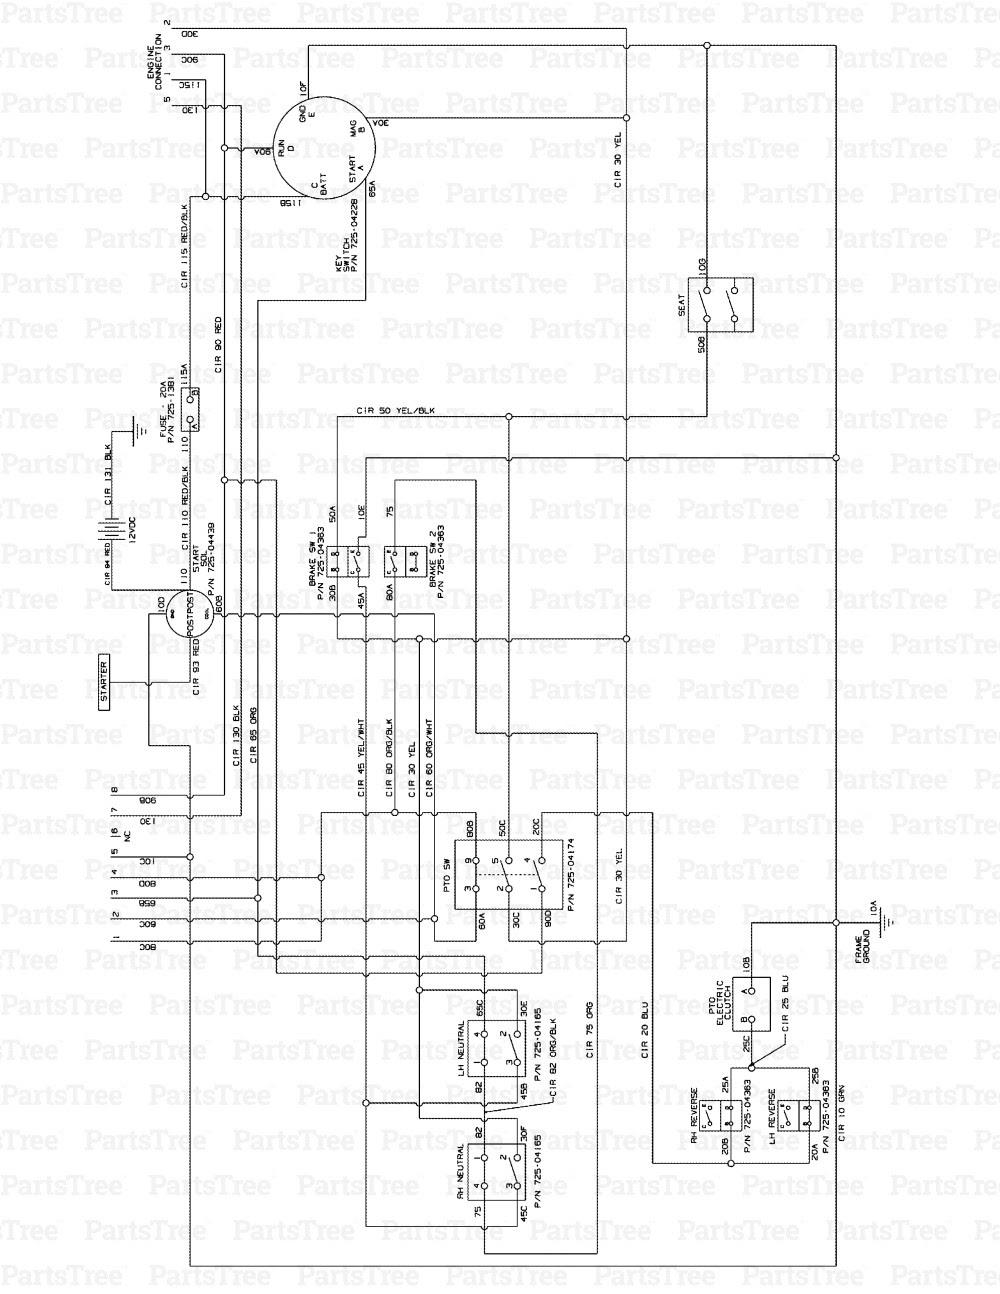 Diagram Opel Kadett Cub Wiring Diagram Full Version Hd Quality Wiring Diagram Blogxgoo Mefpie Fr